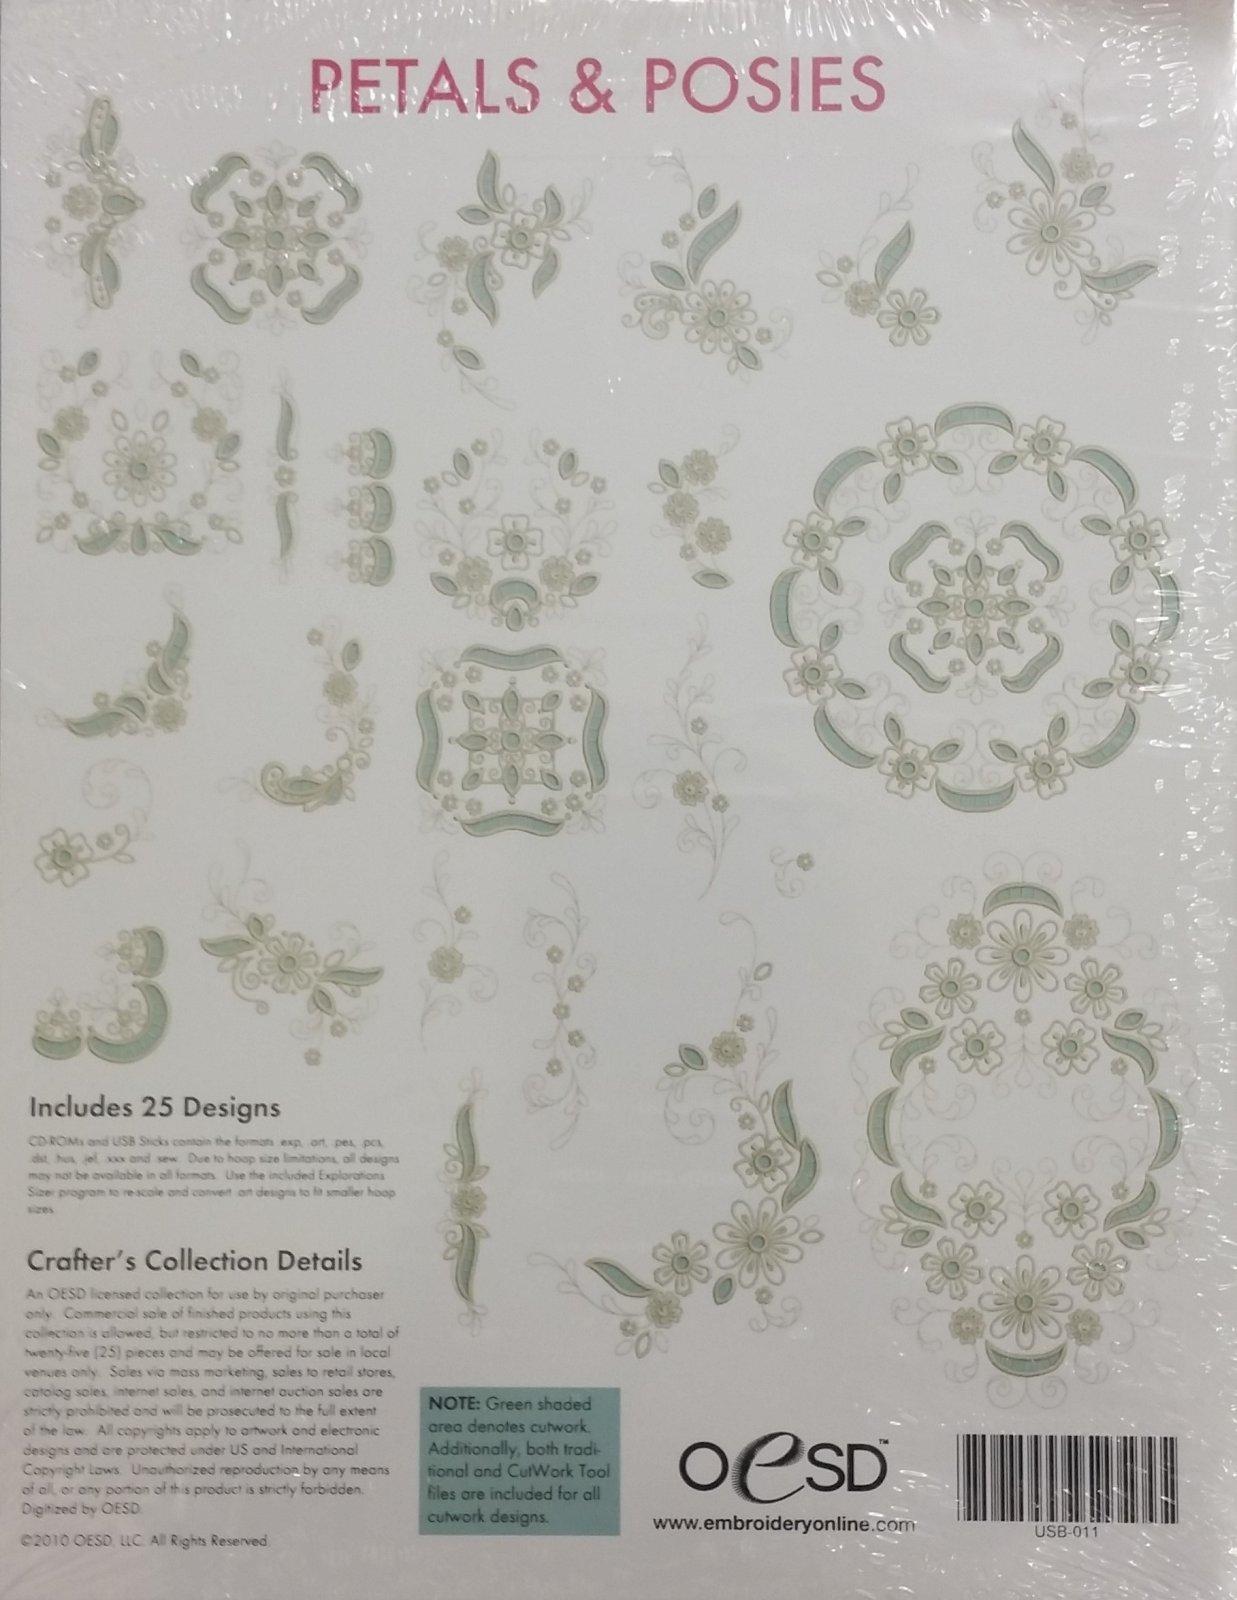 OESD Petals & Posies Embroidery Designs